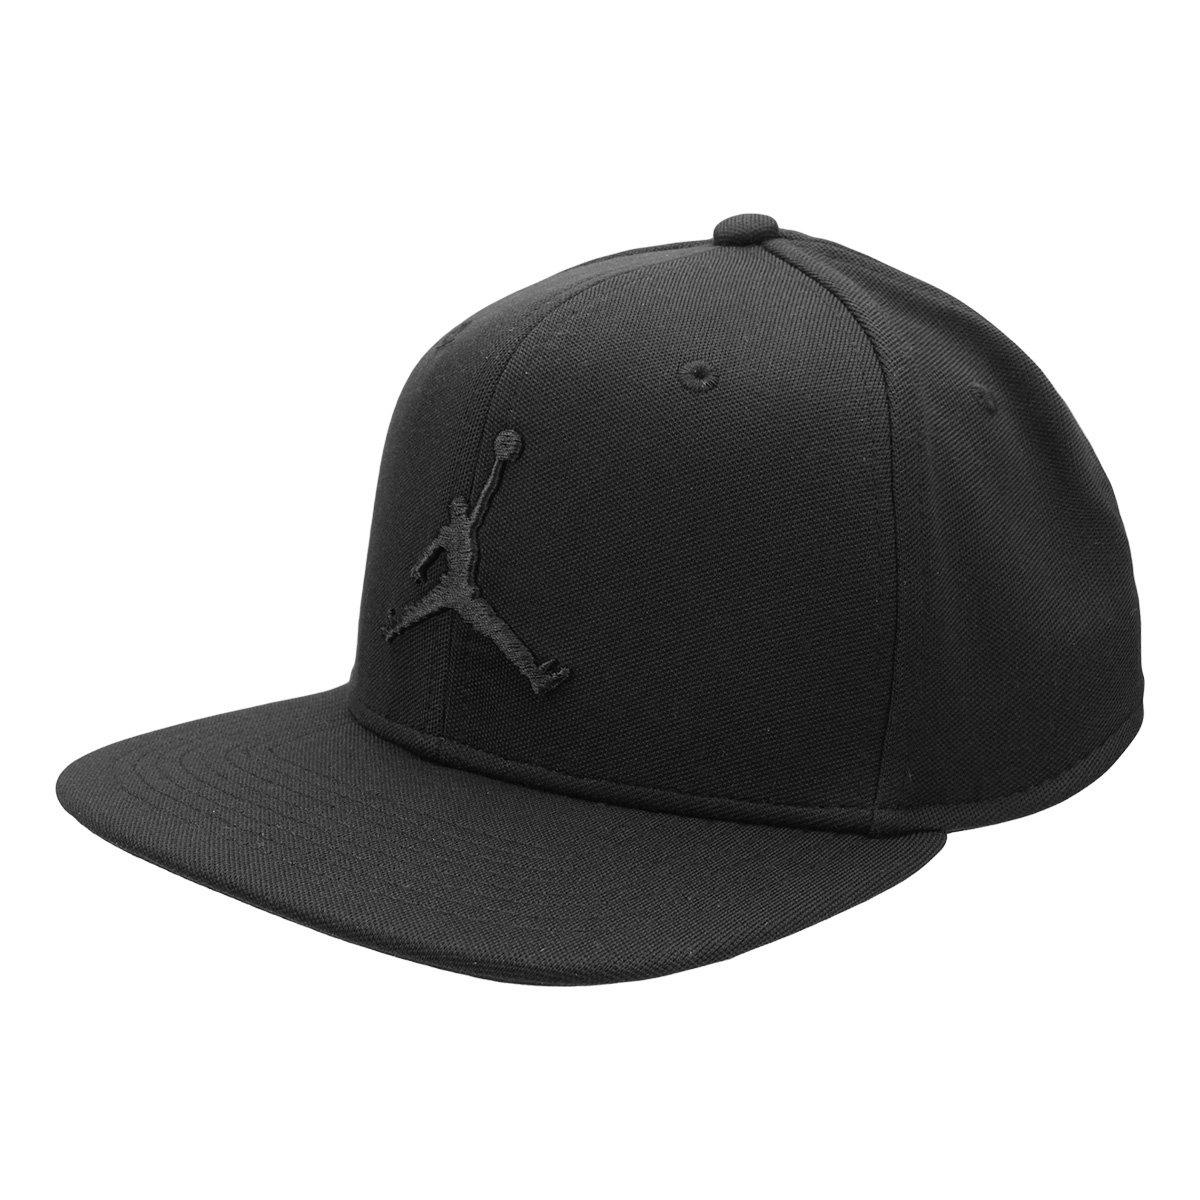 b0d0c8322ac4d Boné Nike NBA Aba Reta Jumpman Jordan - Compre Agora